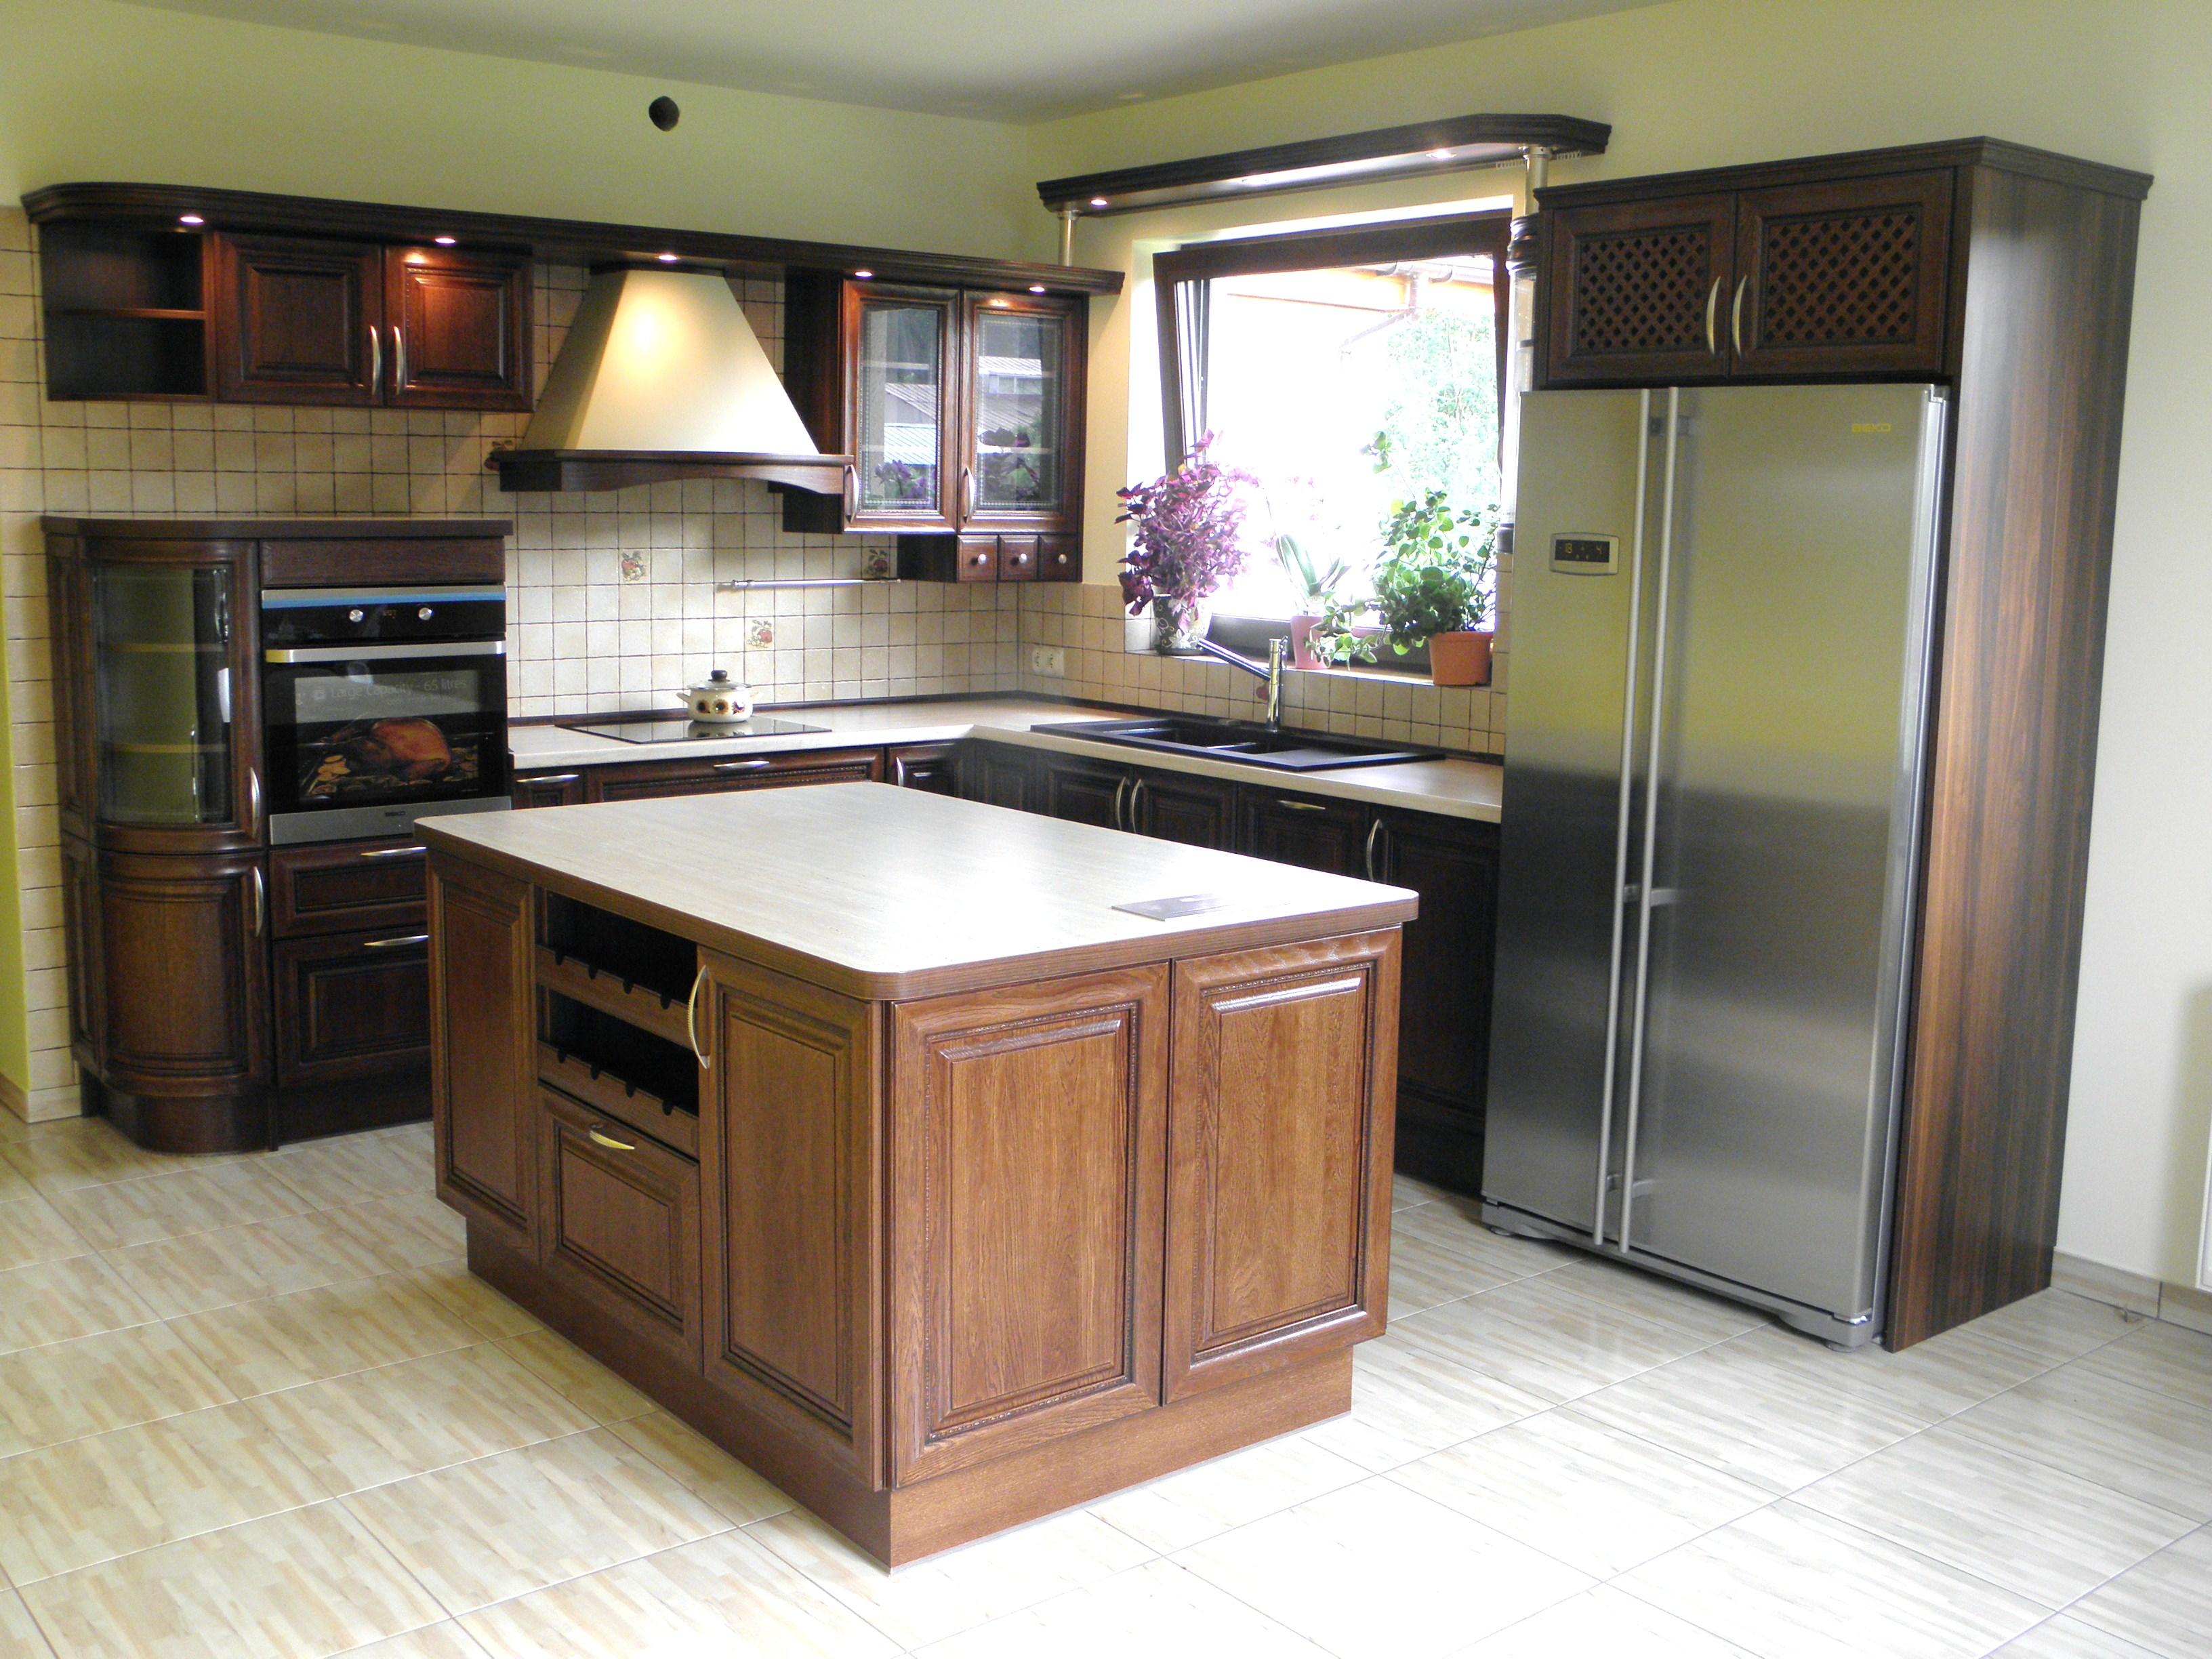 tomir meble kuchenne i azienkowe szafy i garderoby na wymiar. Black Bedroom Furniture Sets. Home Design Ideas